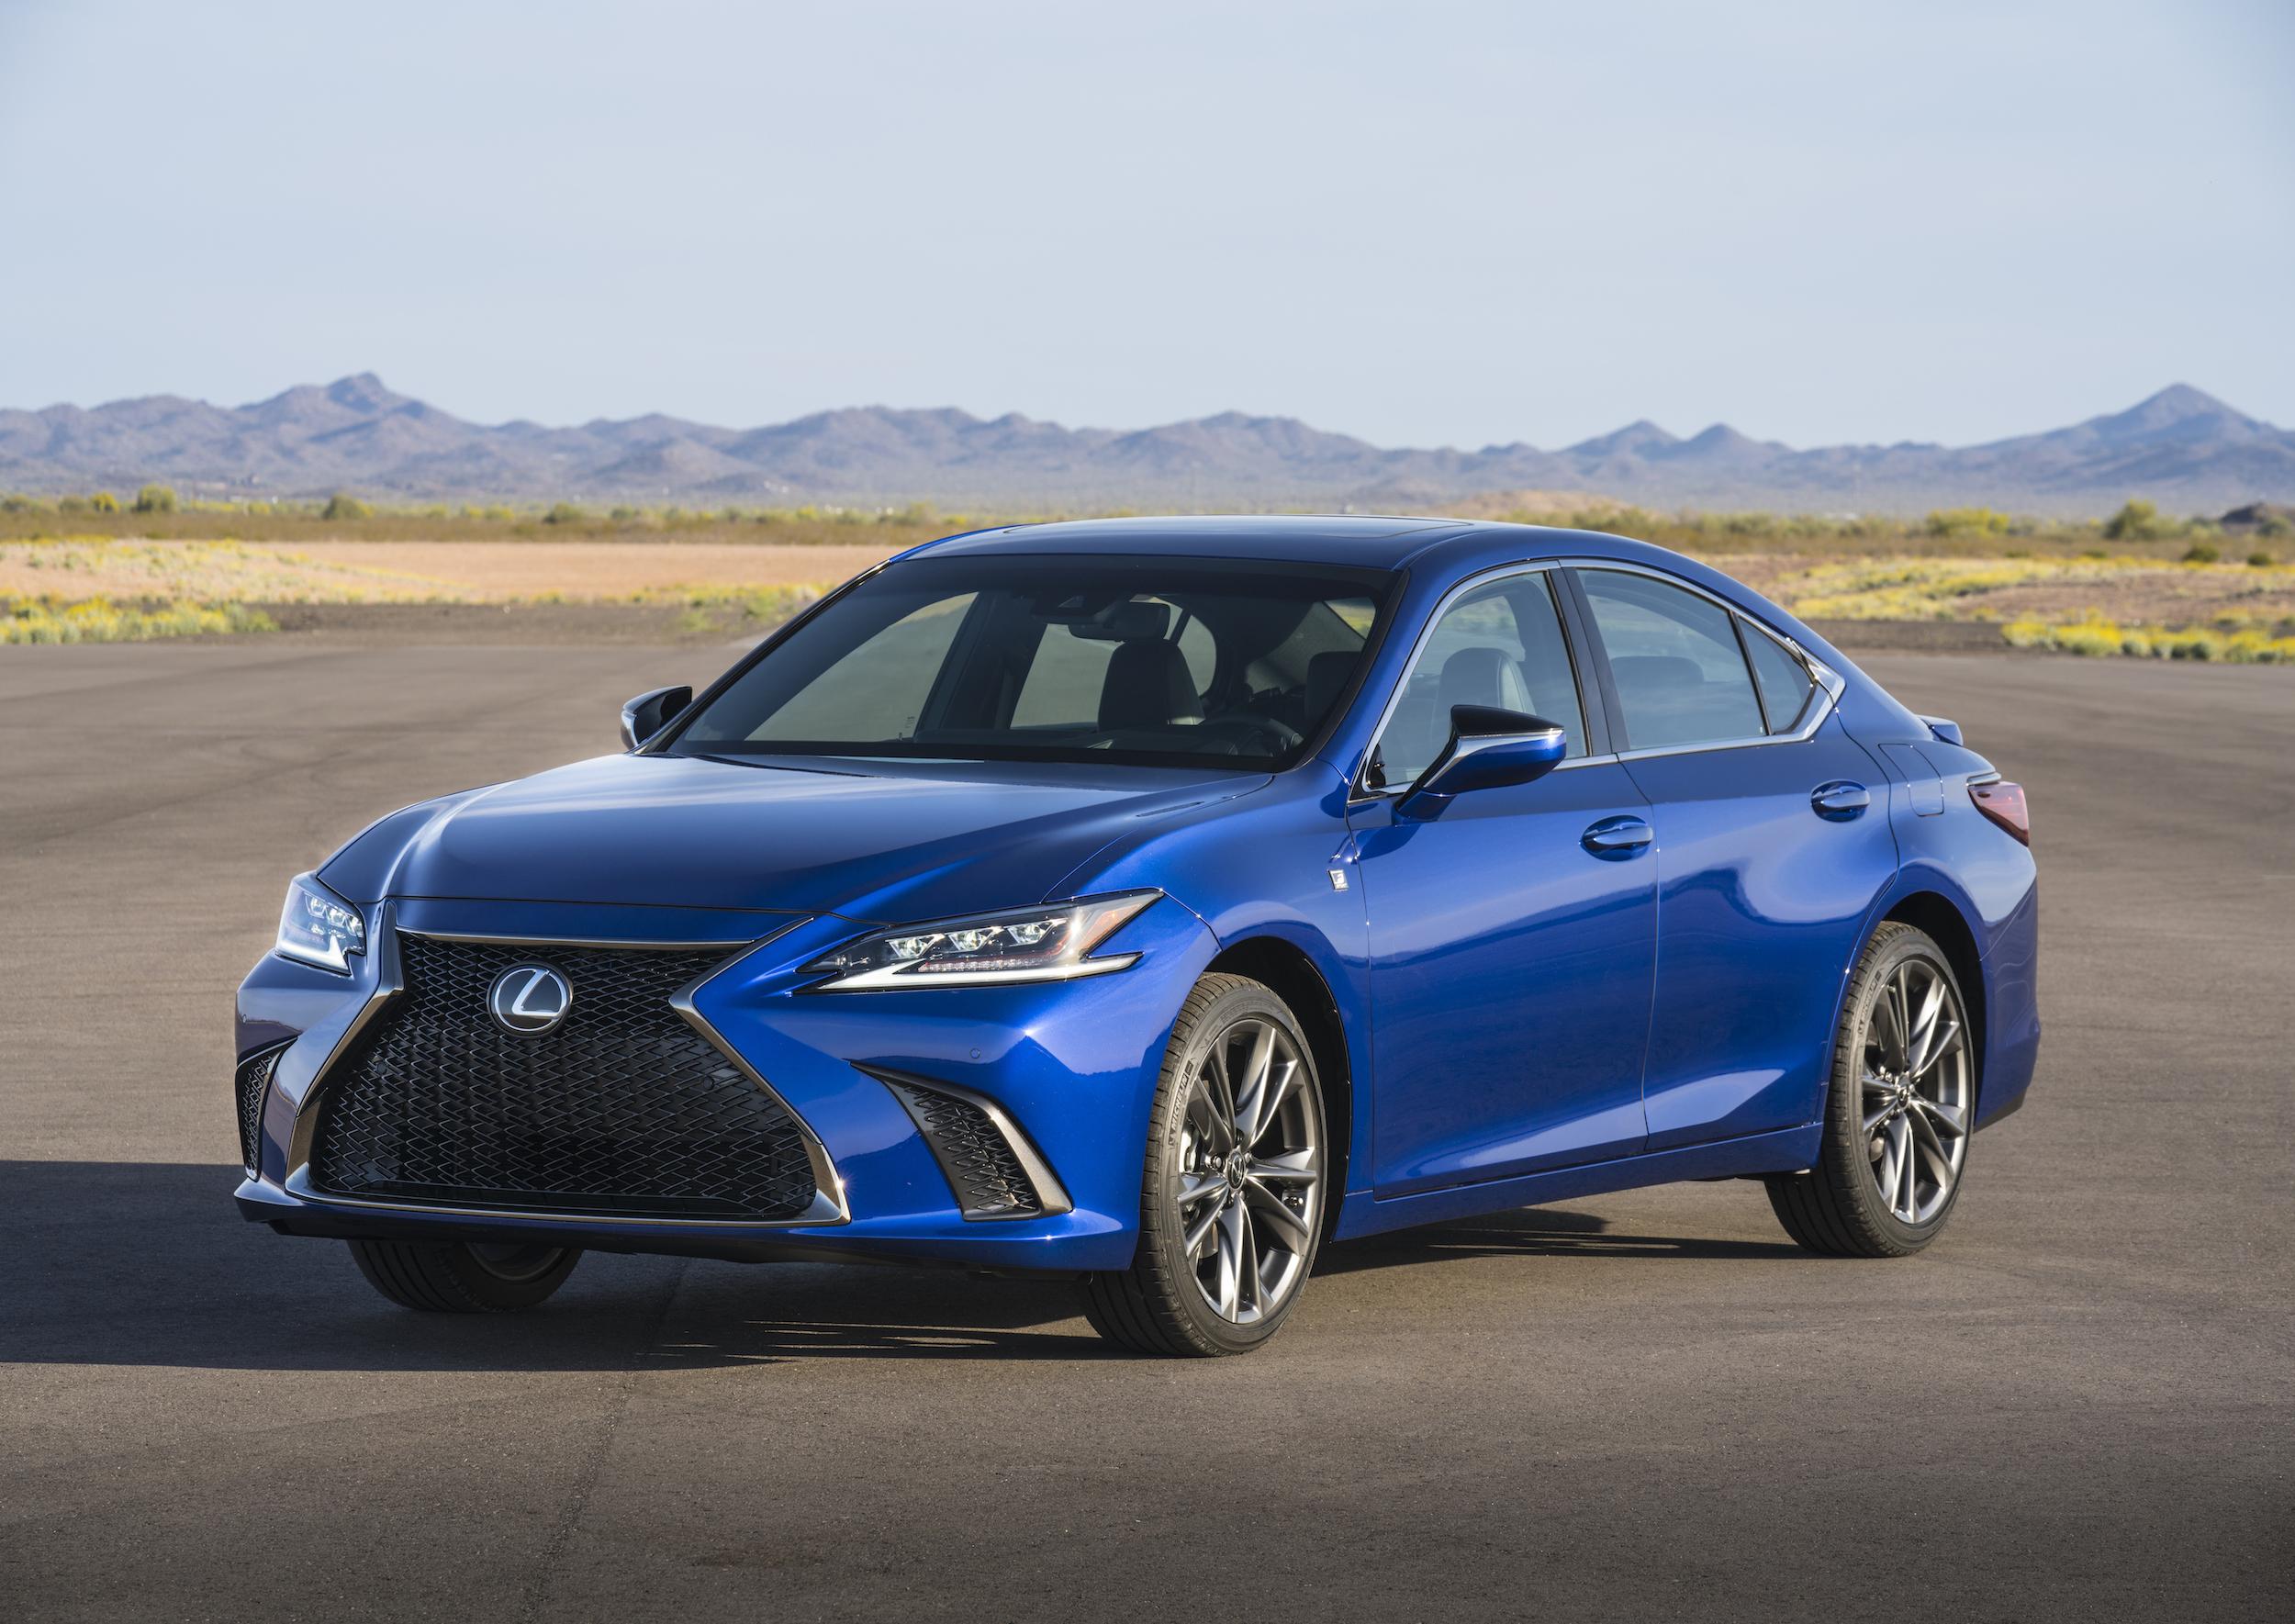 Best-Selling Mid-Sized Luxury Sedans Year-to-Date